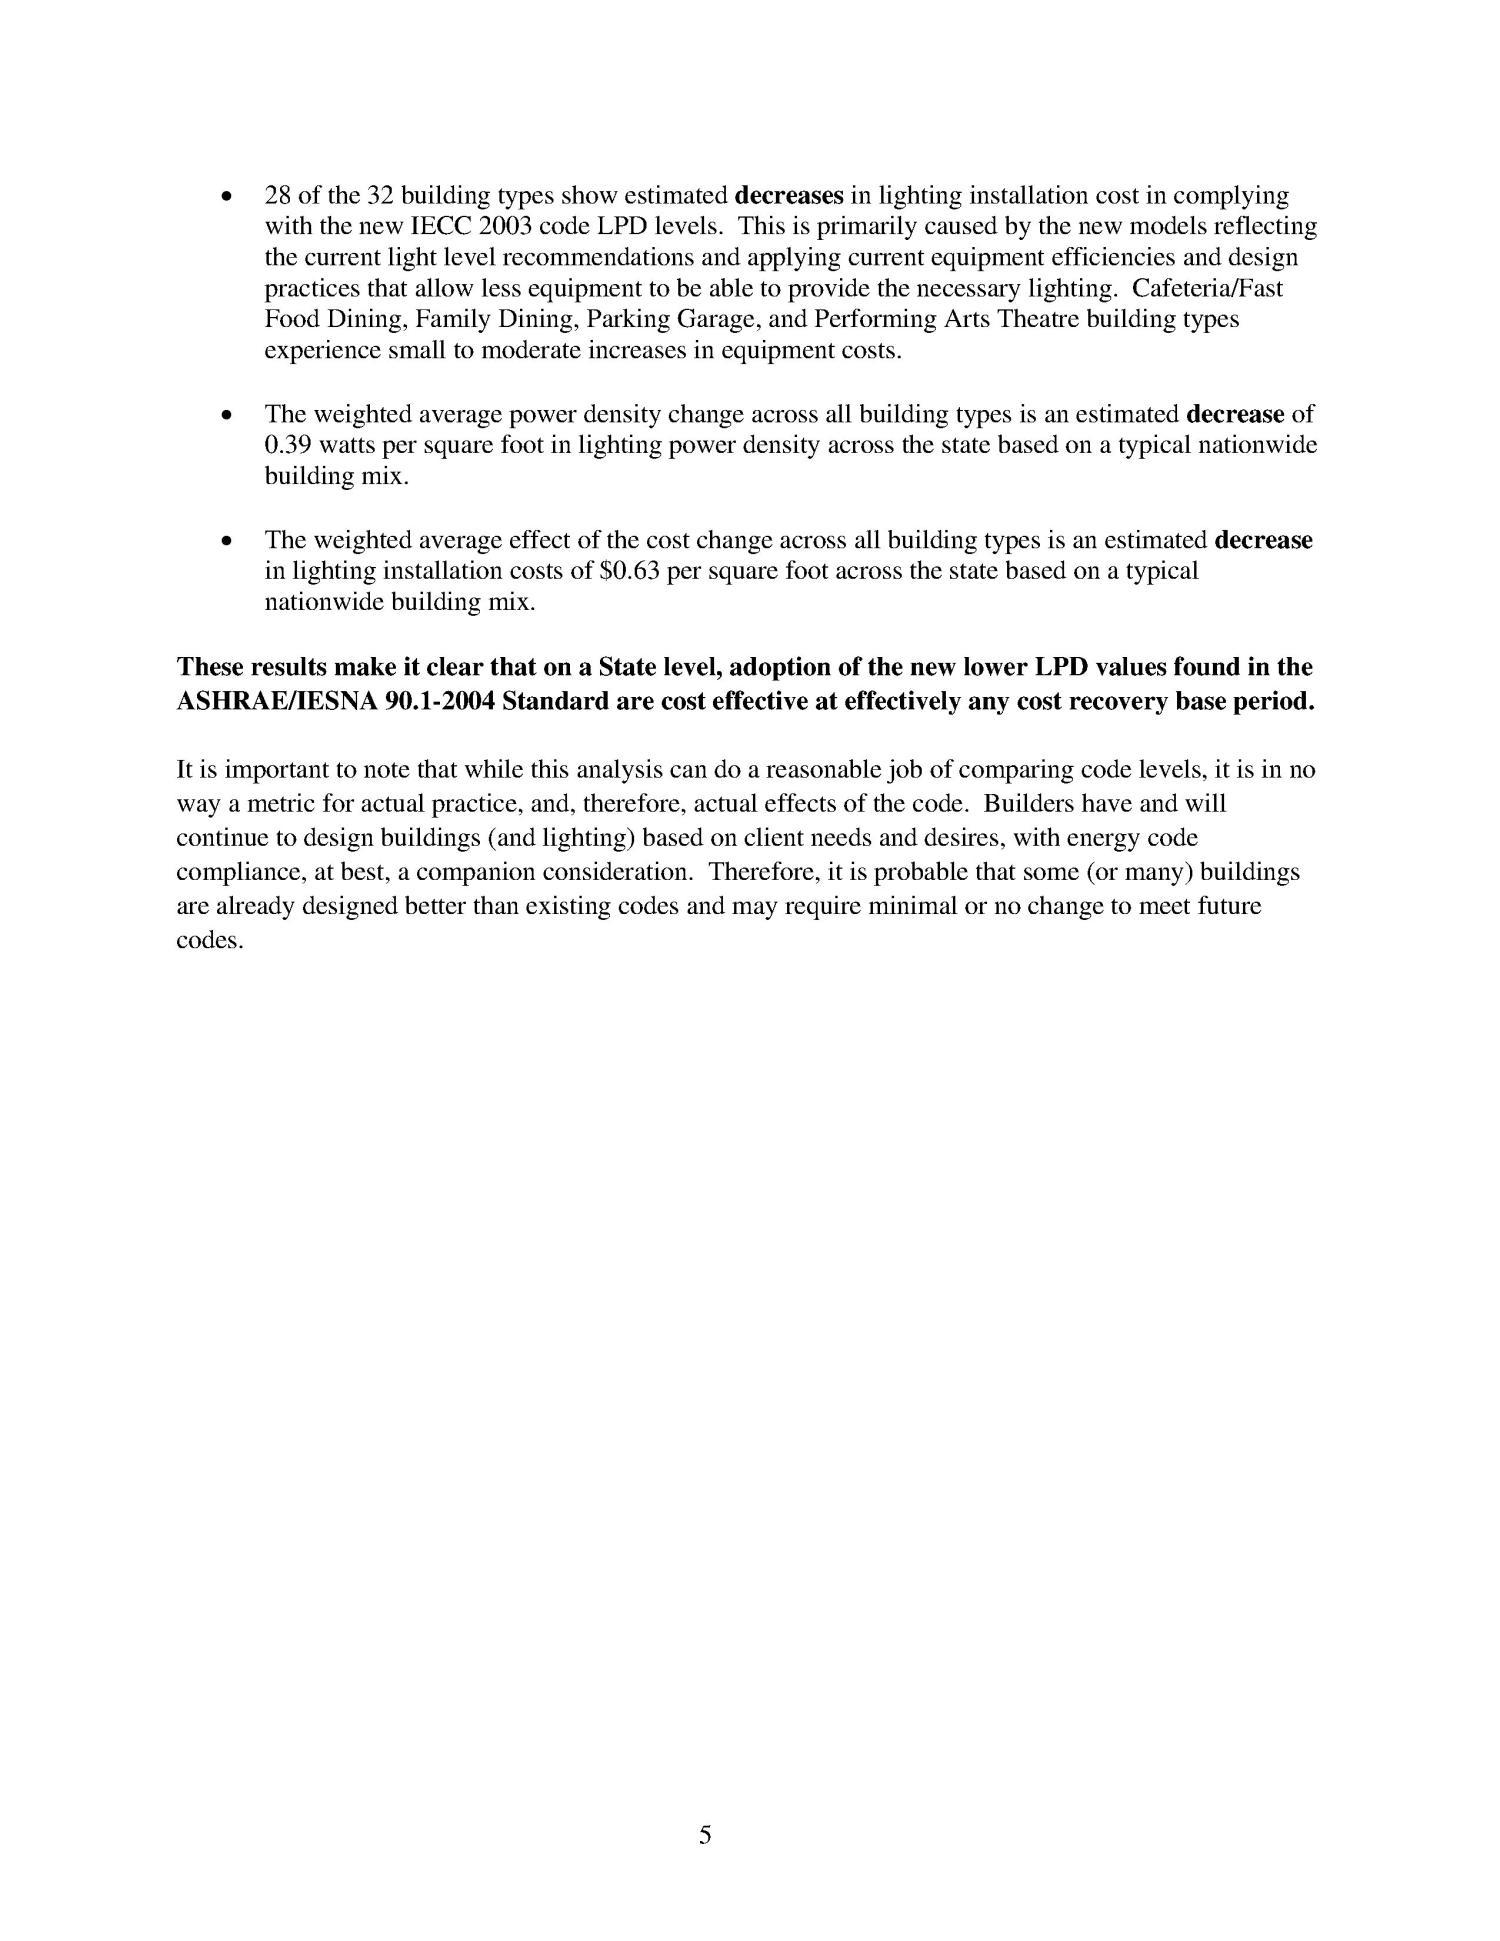 michigan state code adoption analysis cost effectiveness of